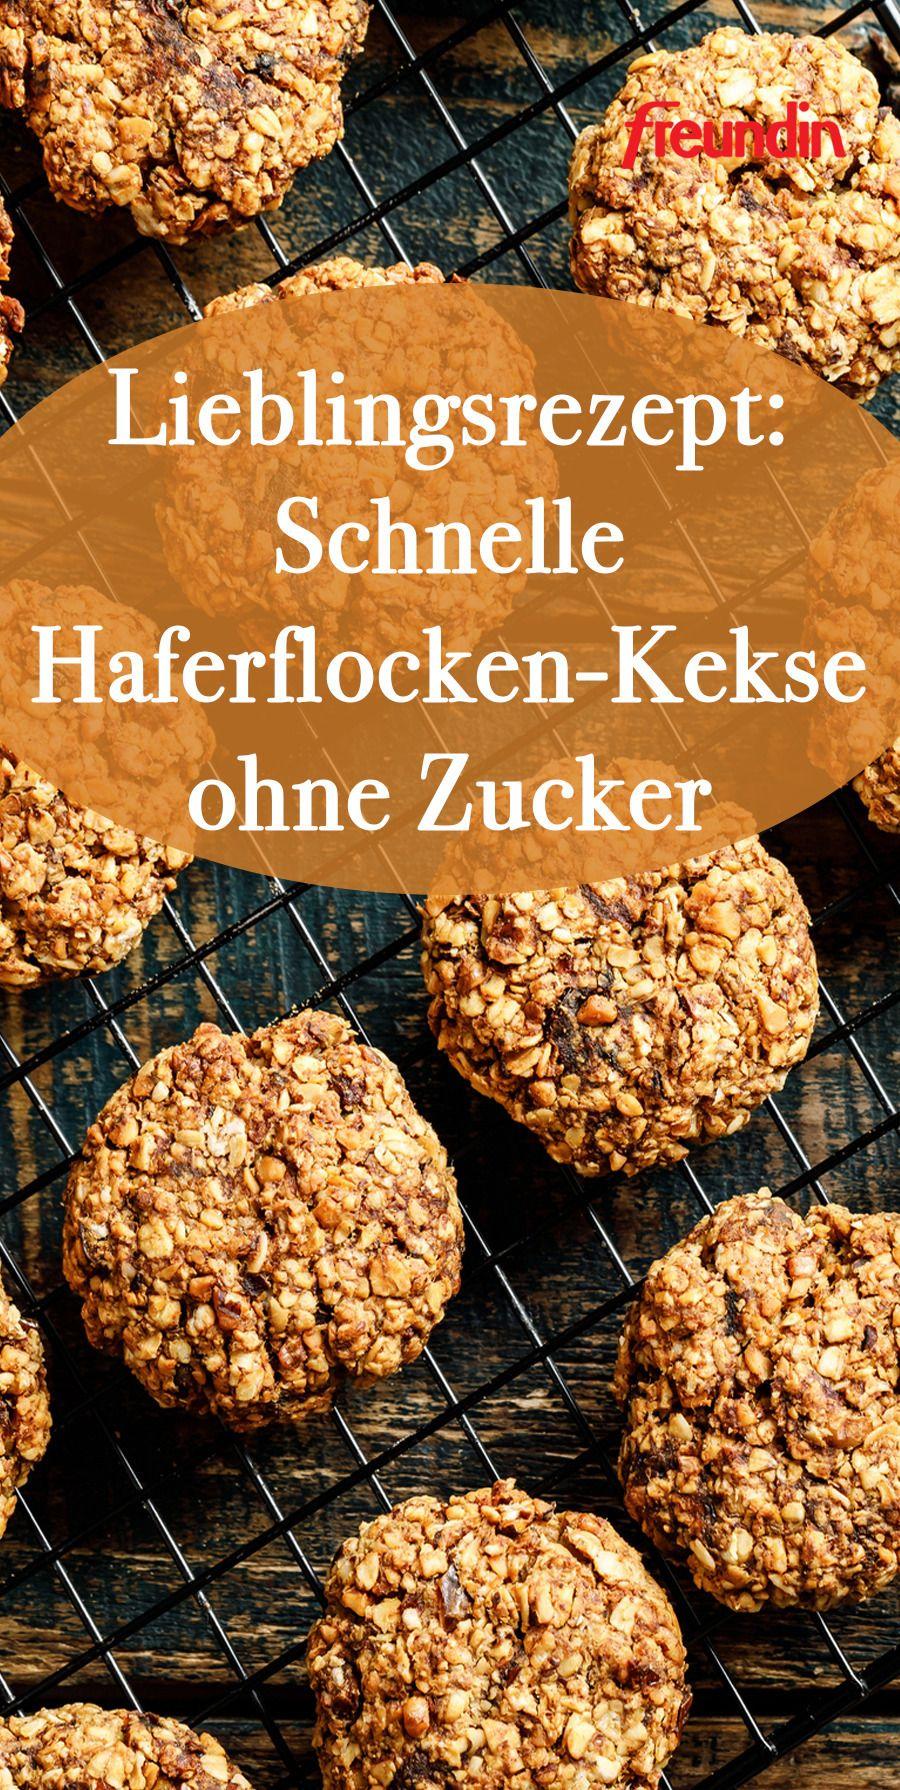 Lieblingsrezept: Schnelle Haferflocken-Kekse ohne Zucker | freundin.de